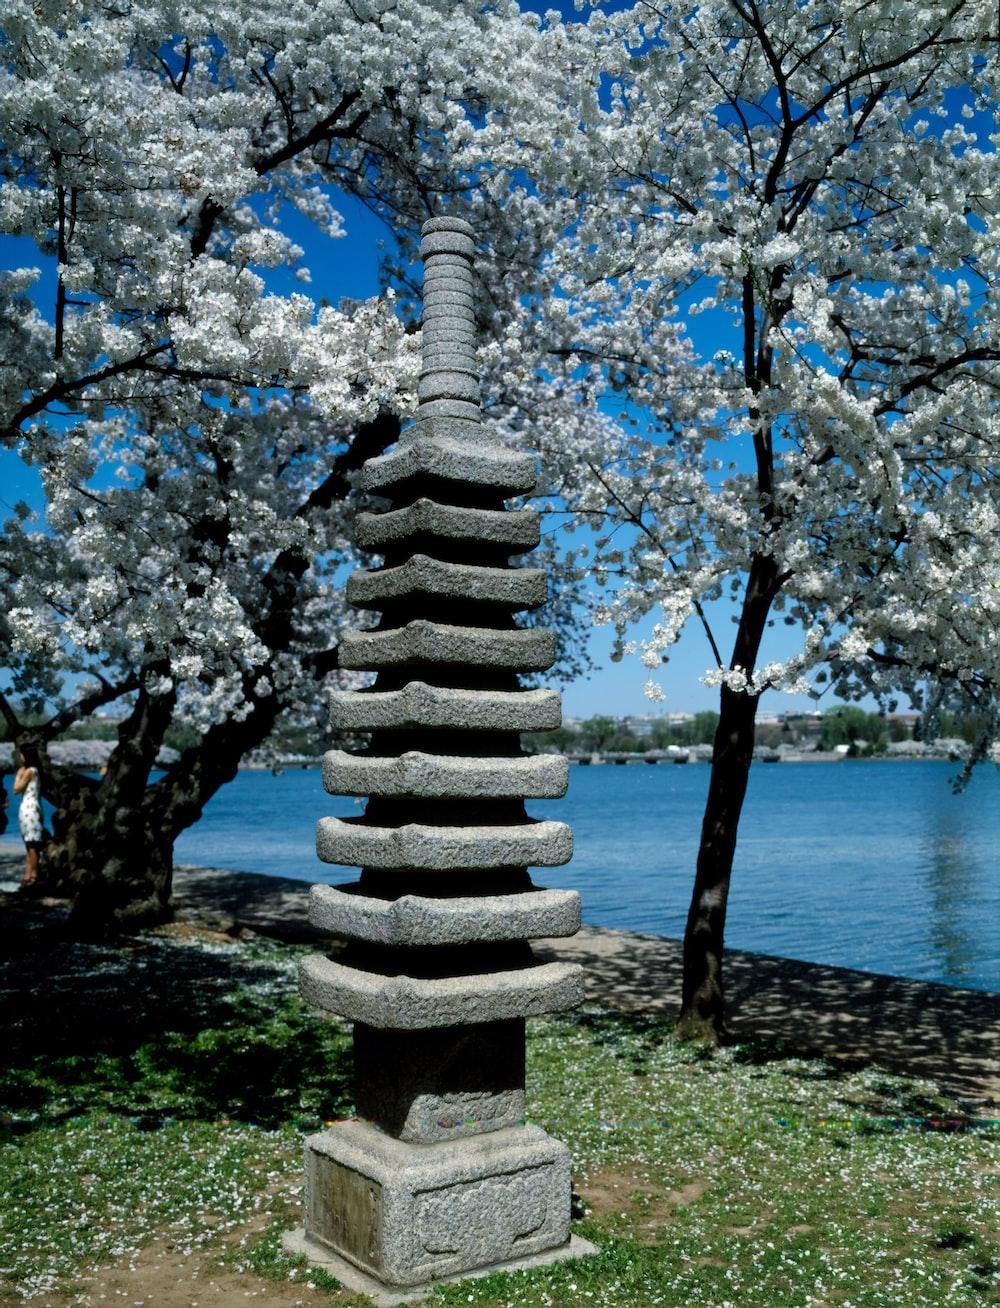 Japanese lantern on the Potomac River Tidal Basin during spring cherry blossom season